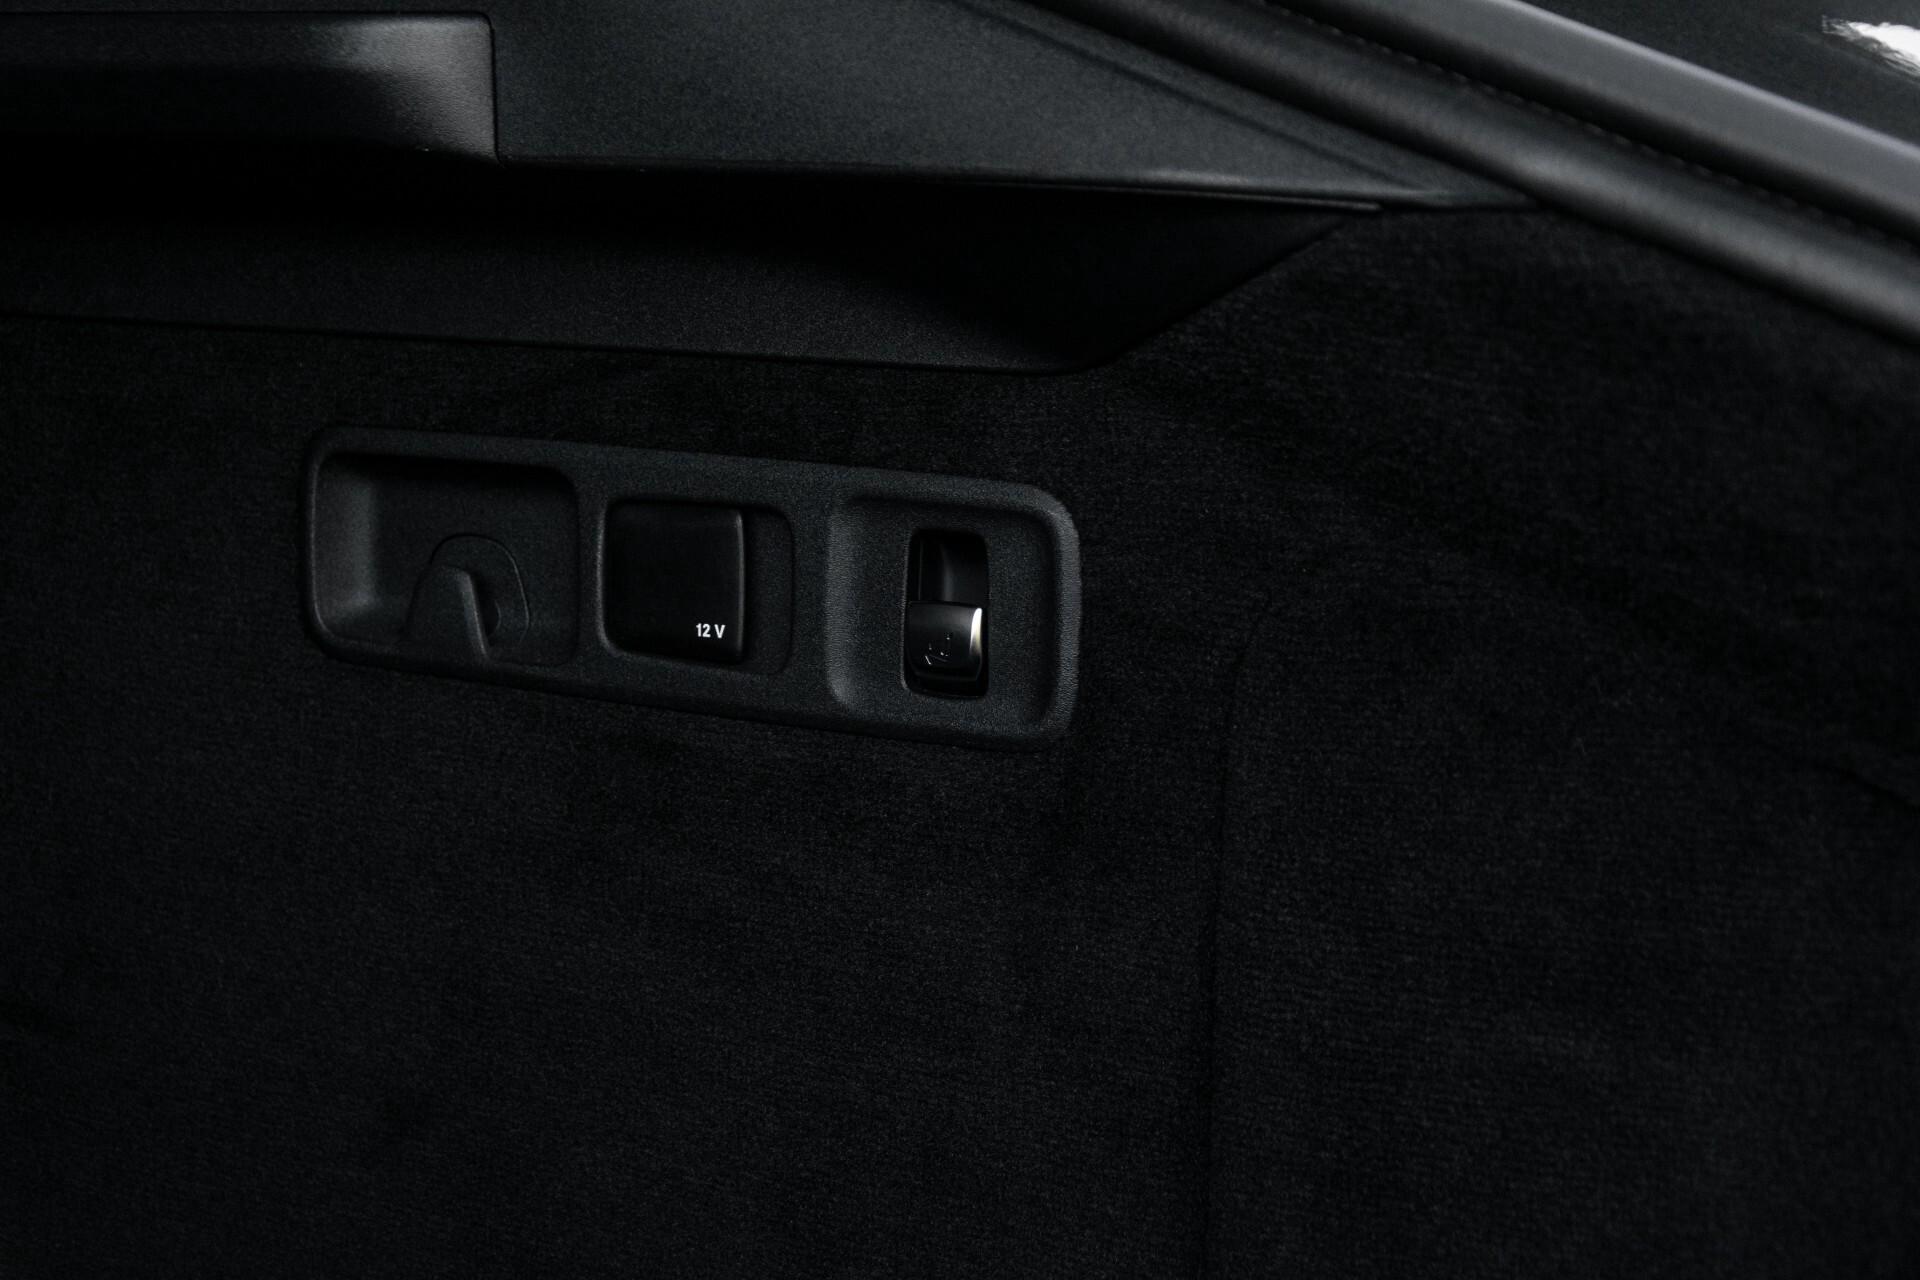 Mercedes-Benz AMG GT 4-Door Coupe 63 S 4MATIC+ Edition 1 Keramisch/Carbon/First Class/Dynamic Plus/Burmester High End 3D Aut9 Foto 77